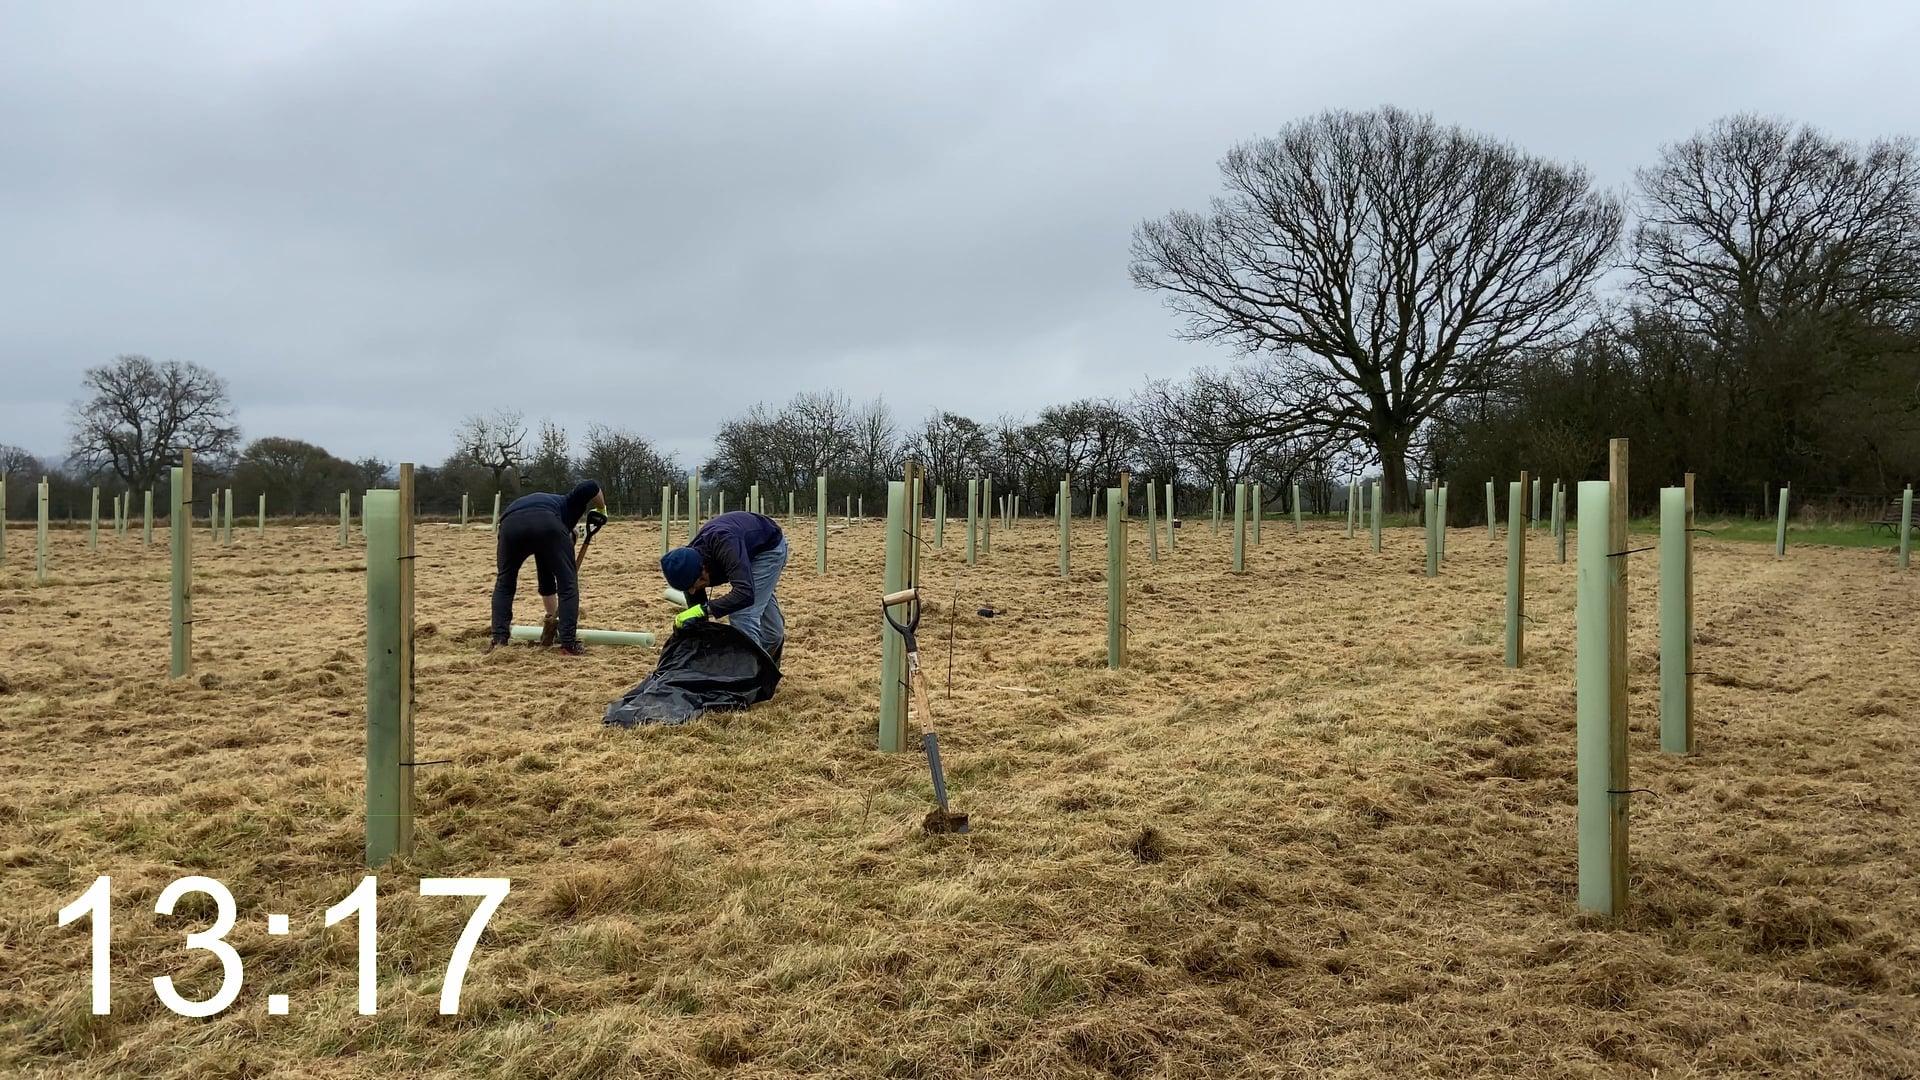 Ninebarrow Woodland Update - Thursday 4th March